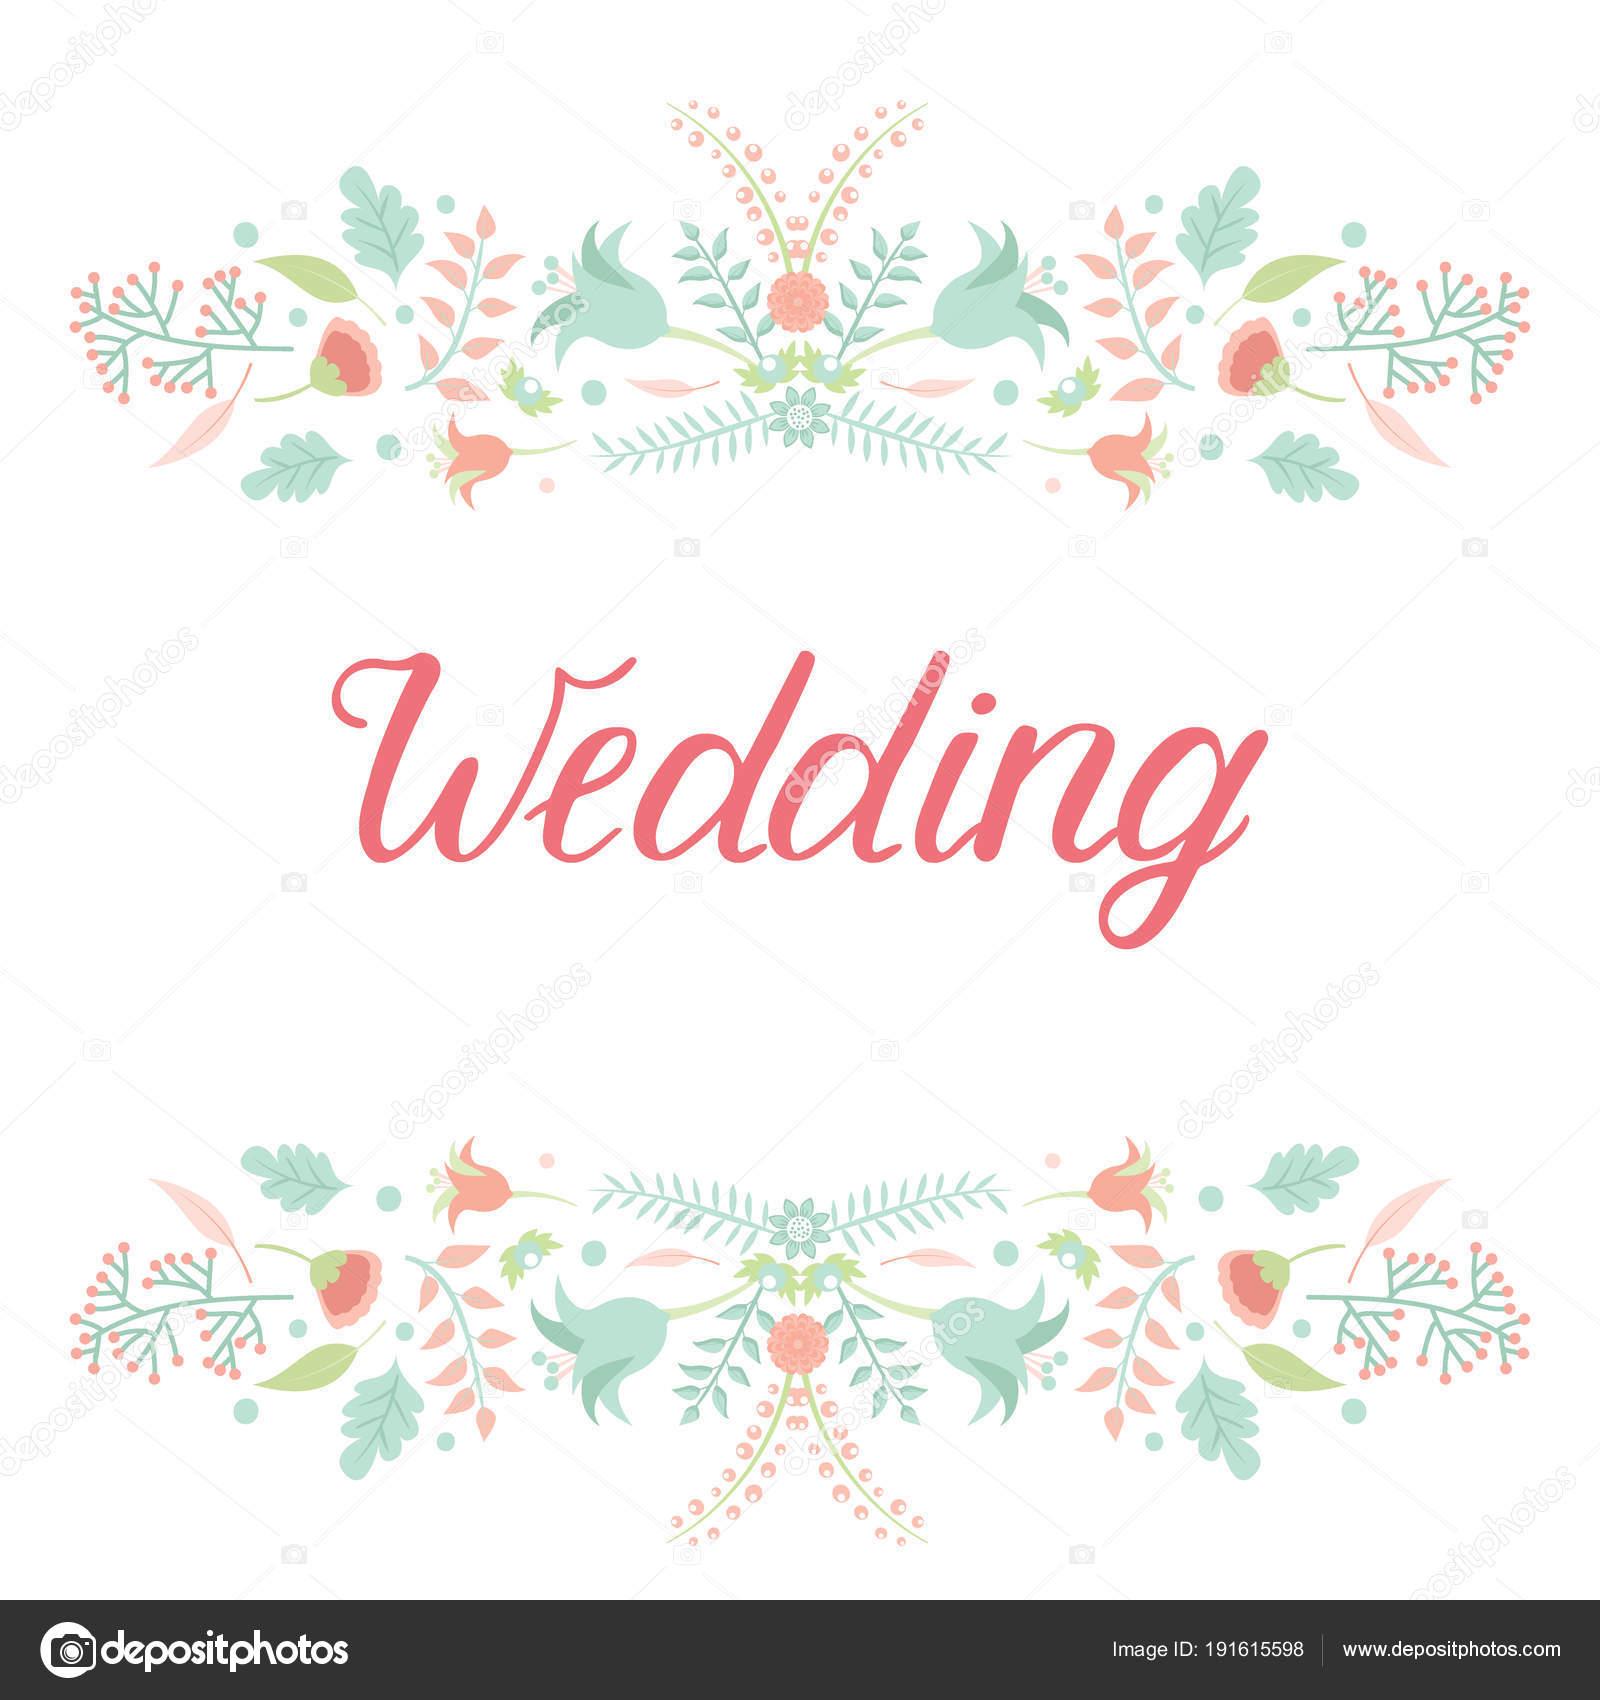 Wedding invitation card vector save the date suite with flower wedding invitation card vector save the date suite with flower templates day marriage handmade lettering print layout design illustration stopboris Choice Image